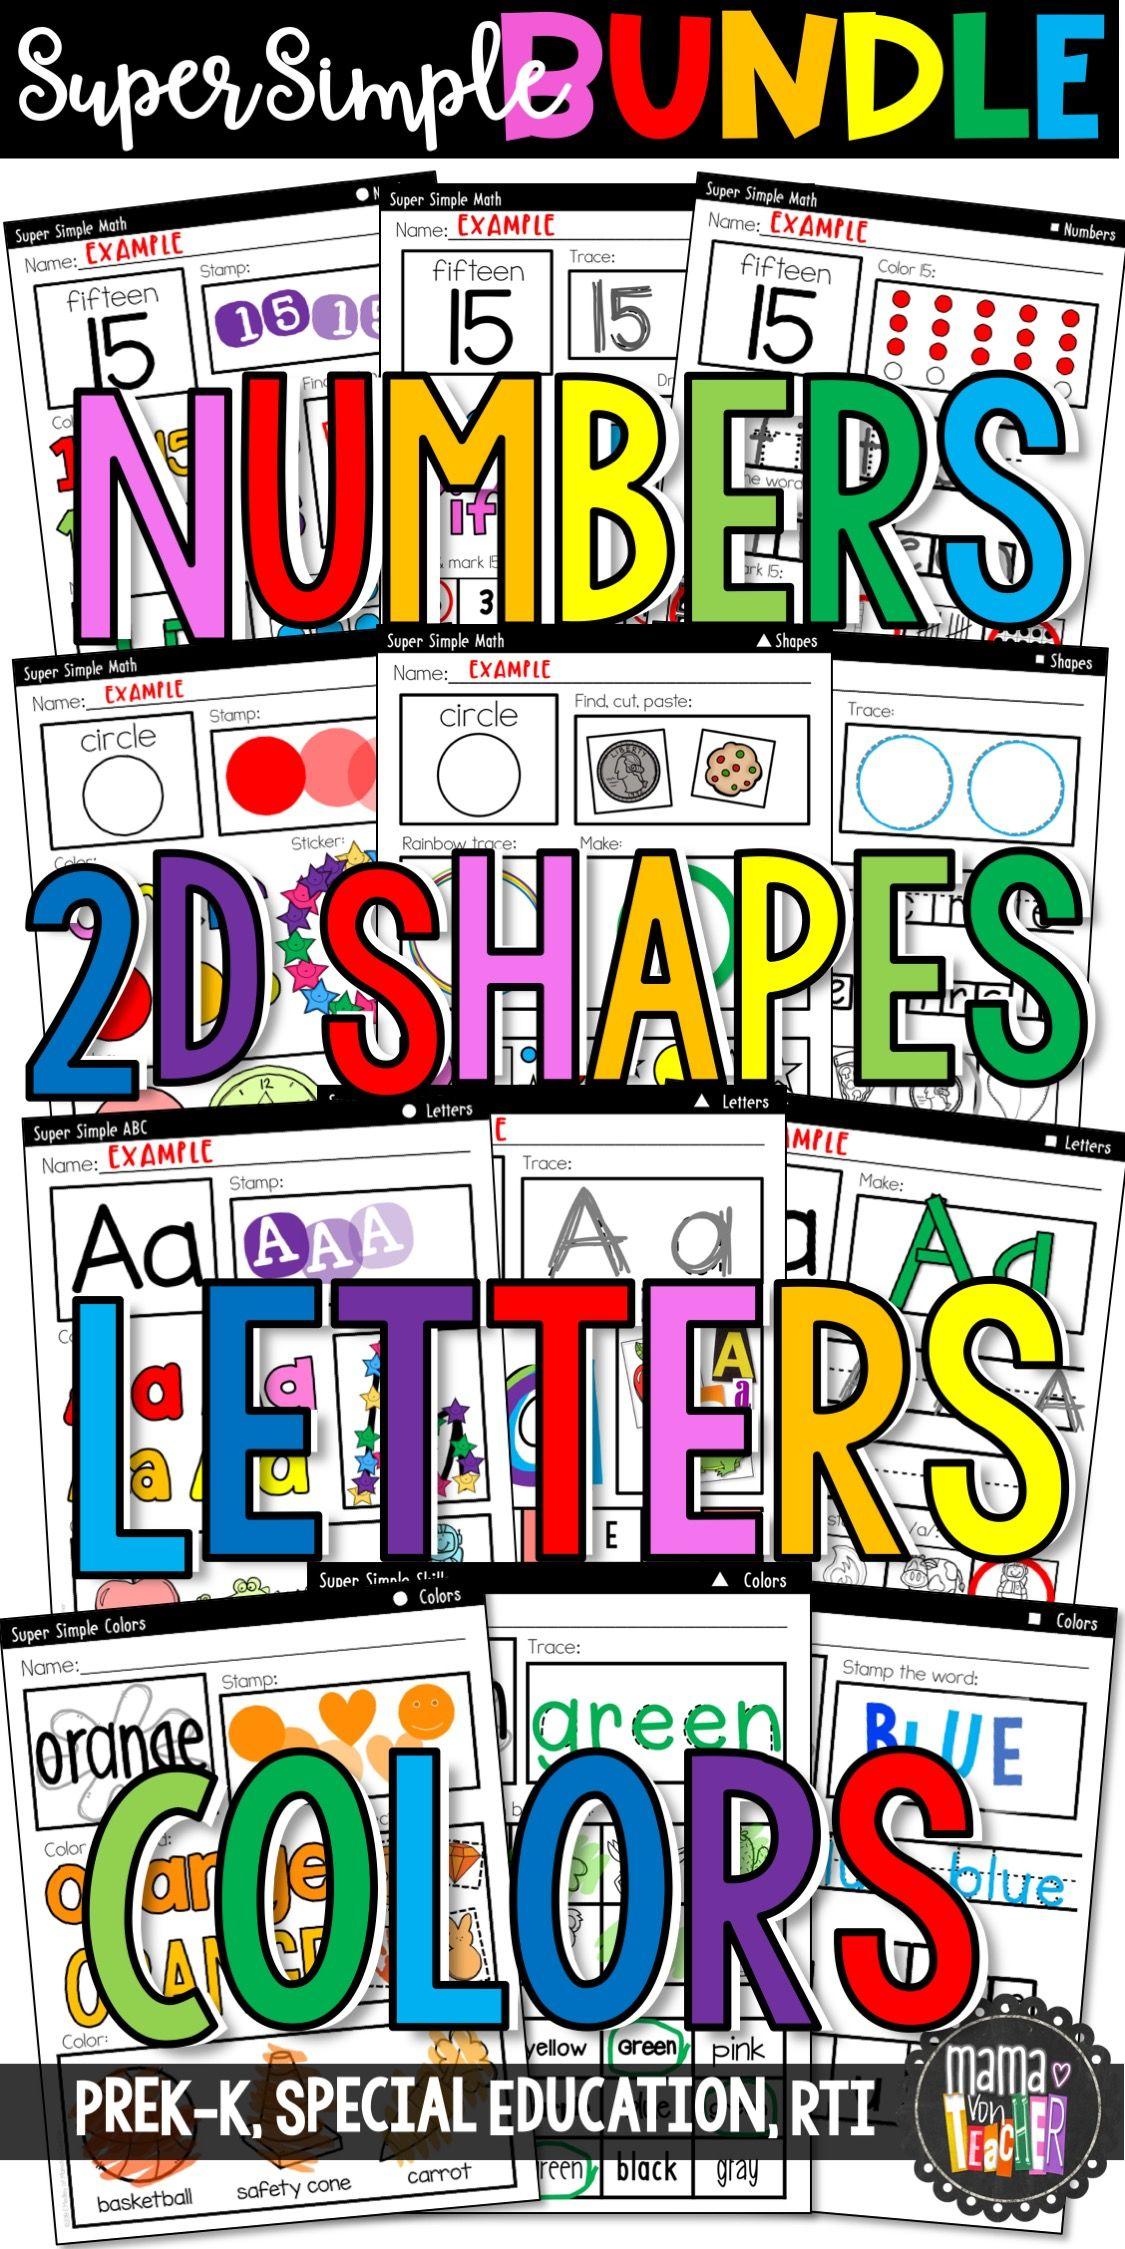 Super Simple Worksheet Bundle Numbers 2d Shapes Letters